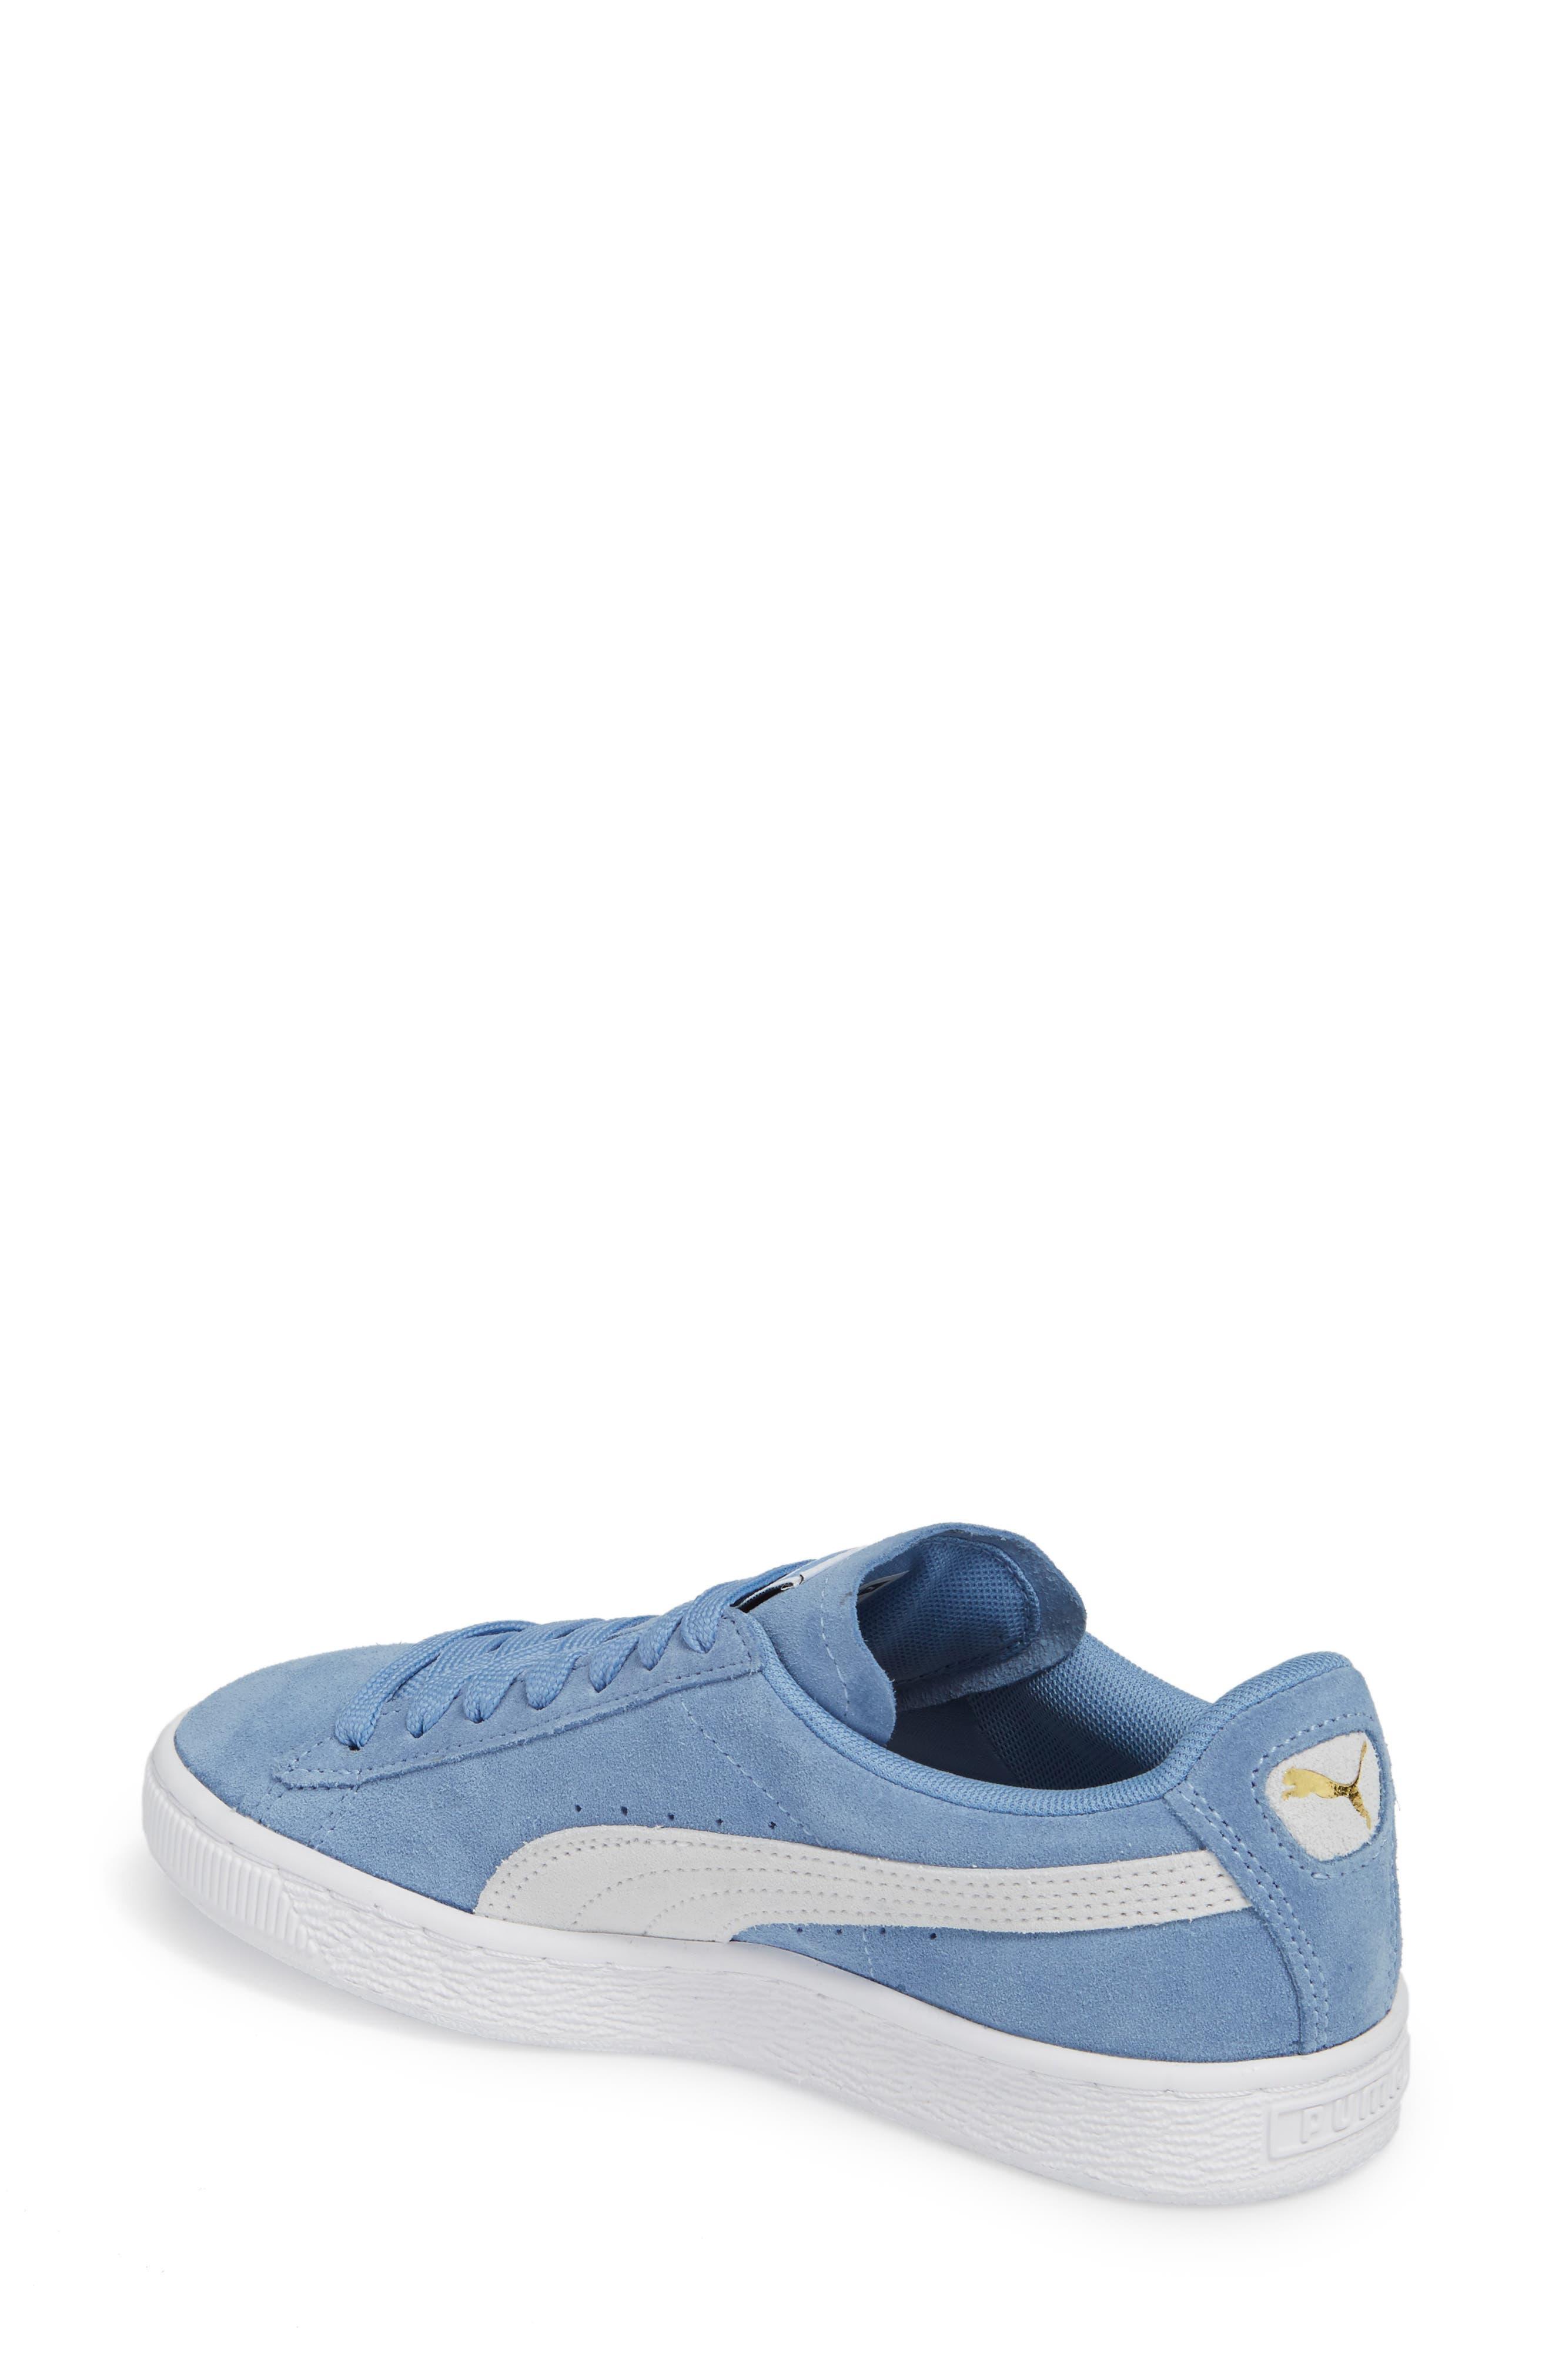 Suede Sneaker,                             Alternate thumbnail 31, color,